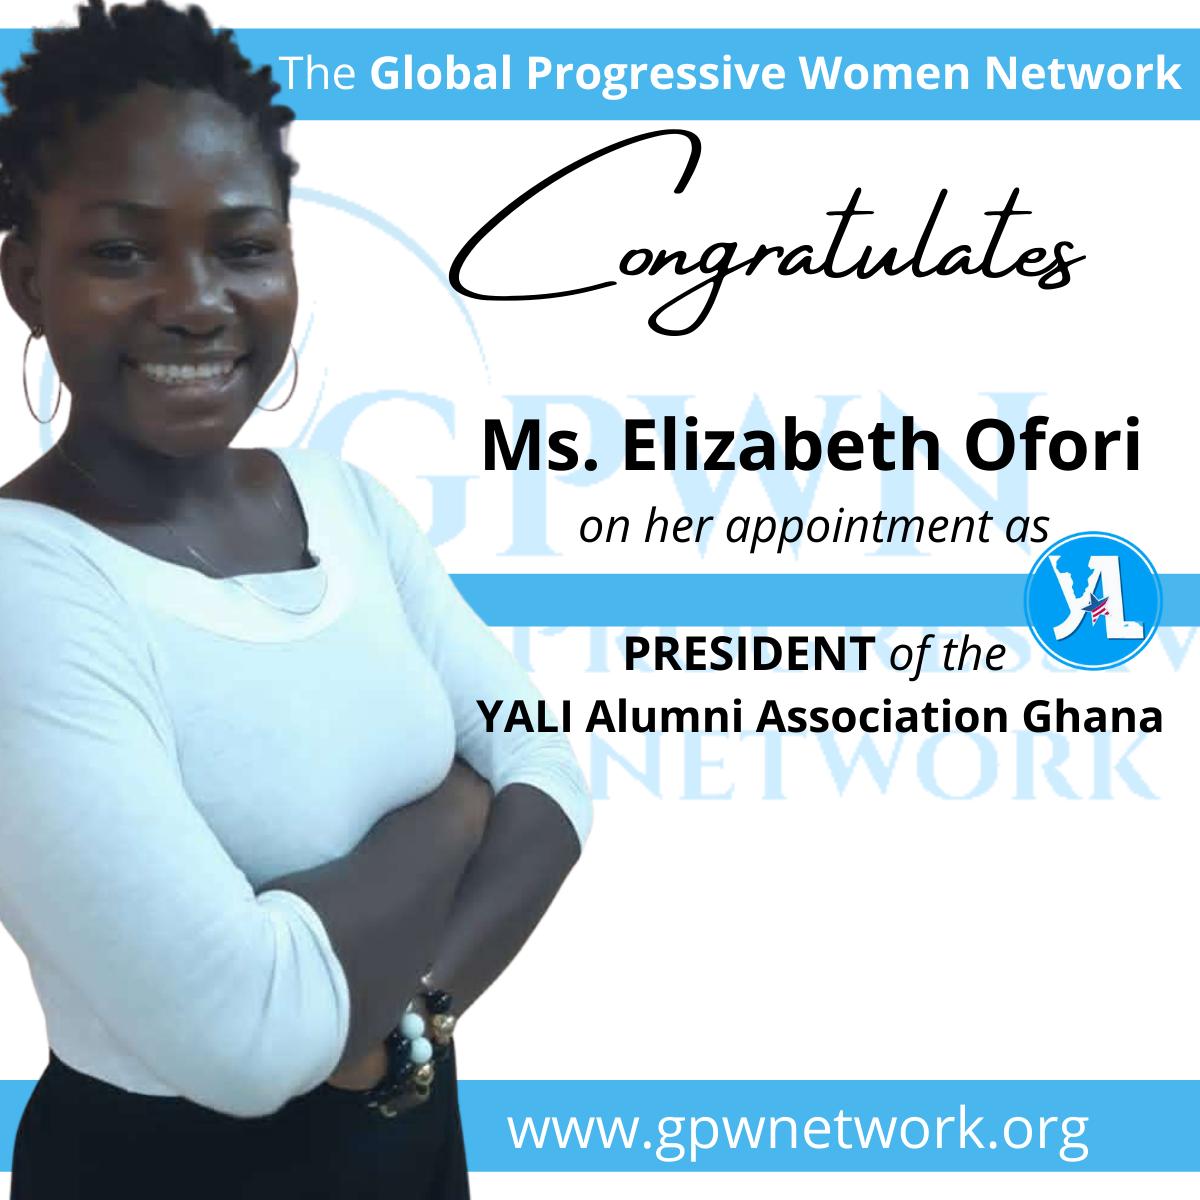 Congratulations toMs.Elizabeth Oforion her appointment asPRESIDENT of theYALI Alumni Association Ghana